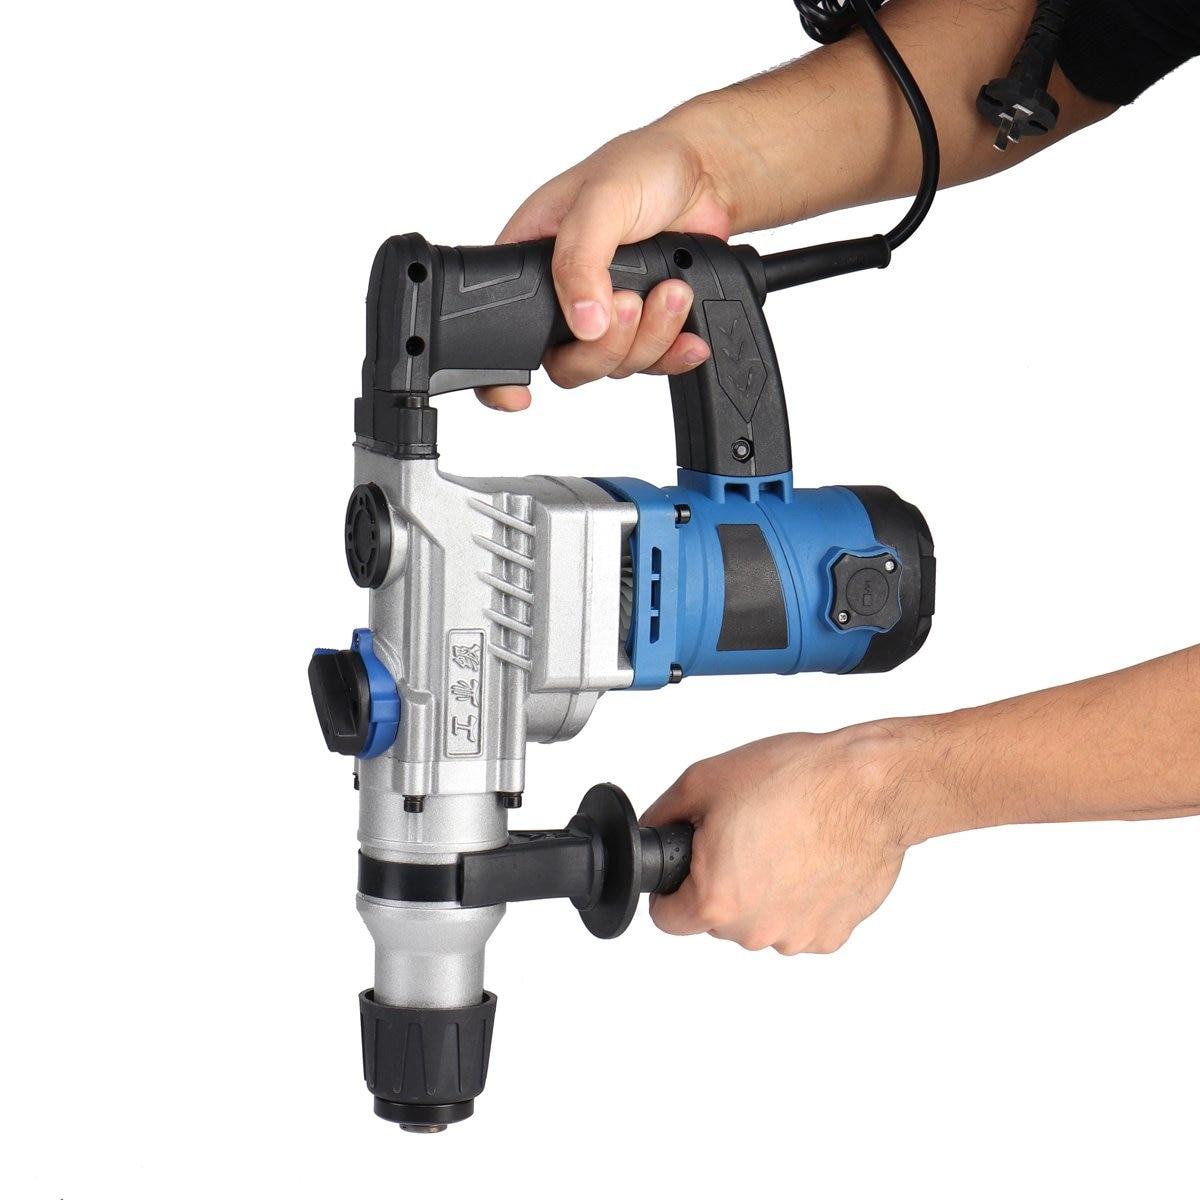 home improvement : Spot Easy Automatic Rivet Tool Set Manual Riveting Tool Pull Cap Heavy Duty Hand Riveter QP2